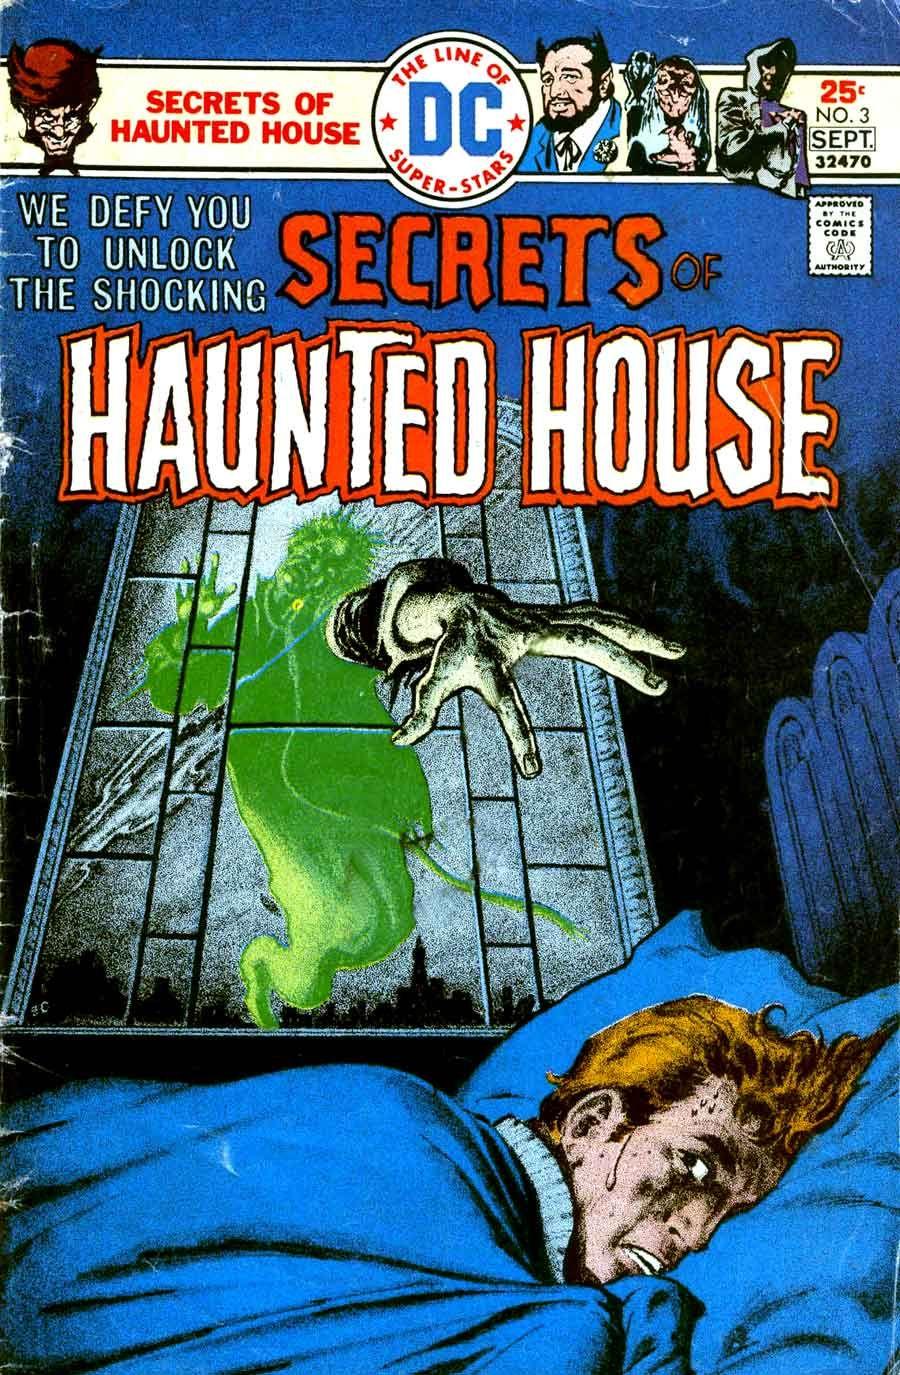 secrets of haunted house comic - Google Search | Vintage Horror